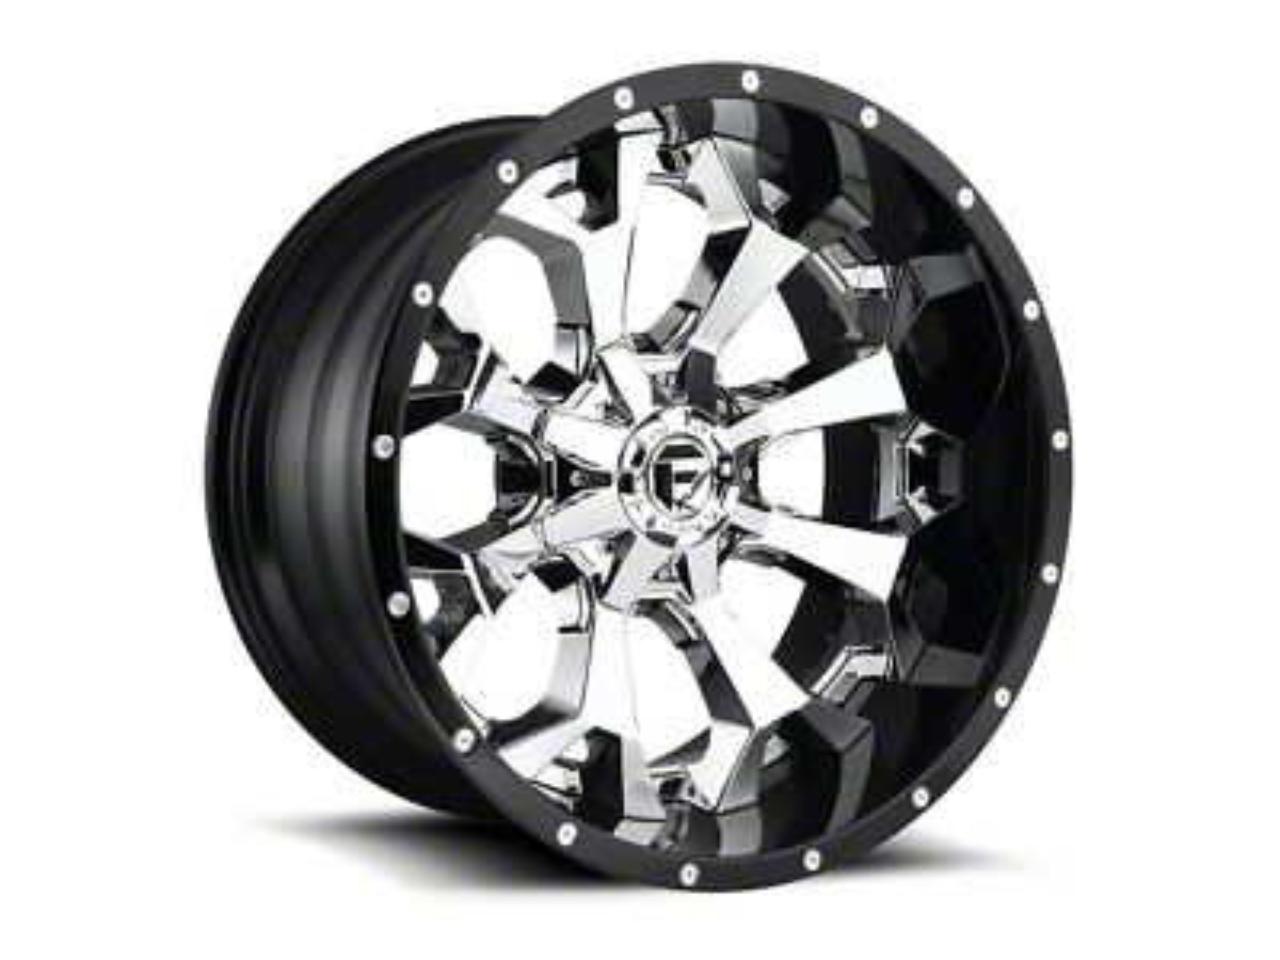 Fuel Wheels Assault Chrome 6-Lug Wheel - 22x12 (07-18 Sierra 1500)